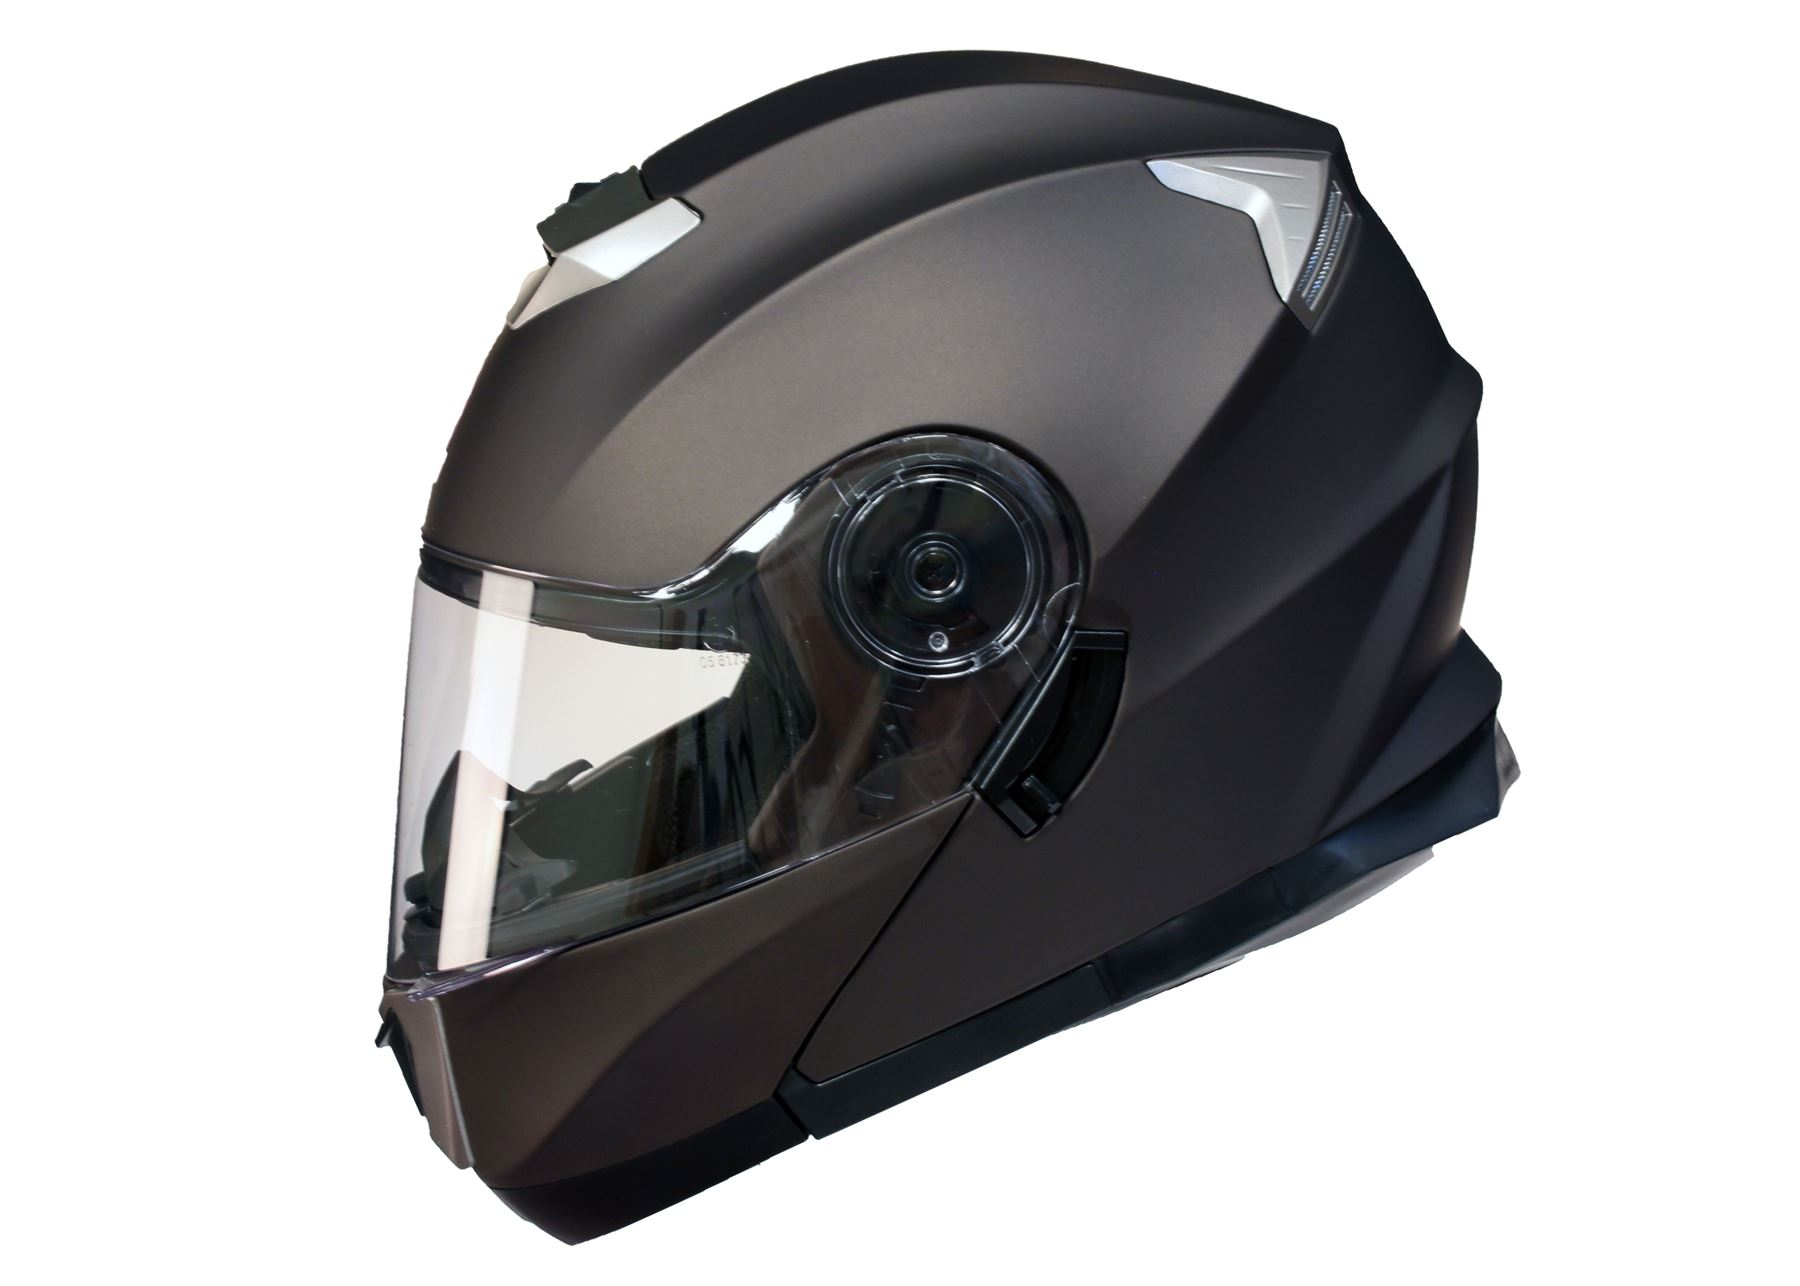 MODULAR-Flip-up-Front-Helmet-DOUBLE-Visor-MOTORCYCLE-Motorbike-Colour-CHOICE miniature 5